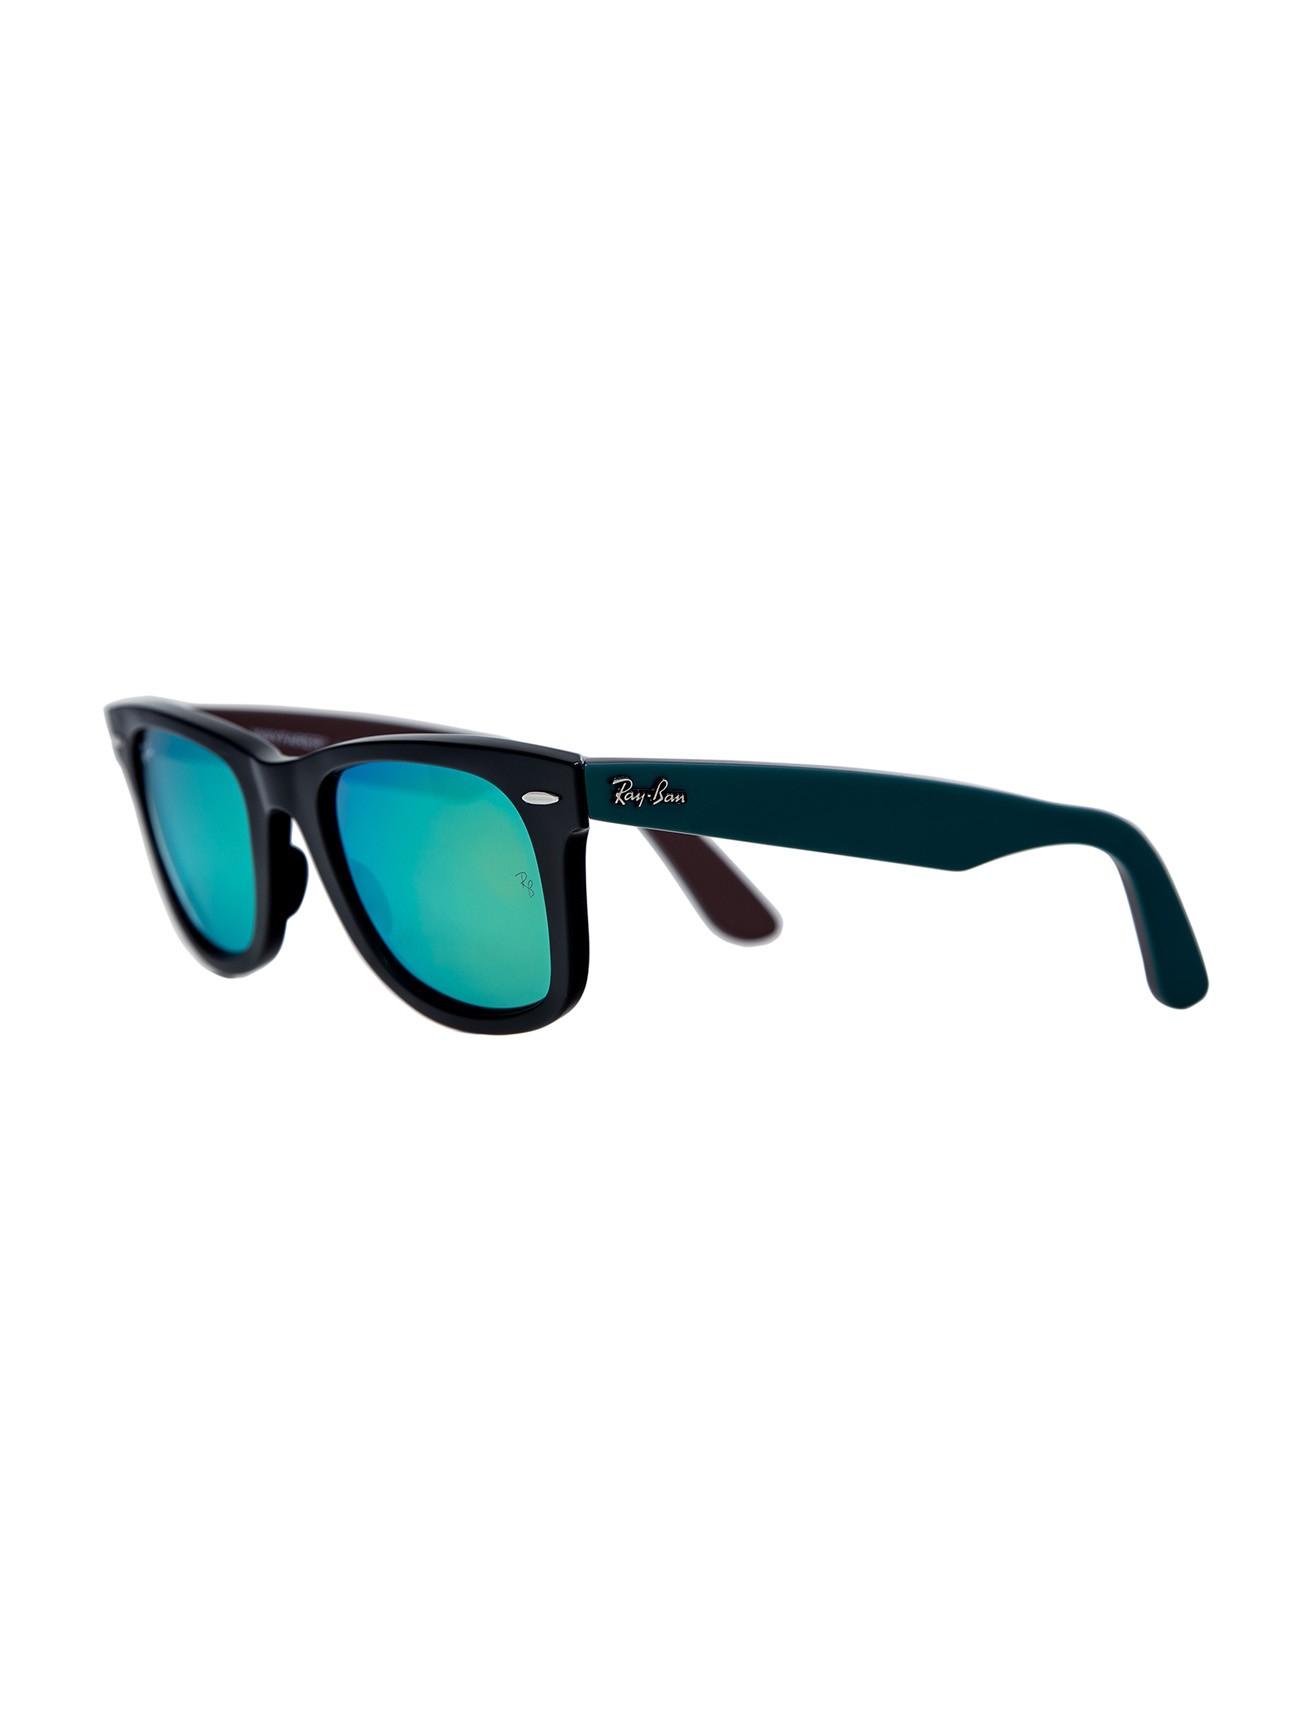 how to ray sunglasses wayfarer clean ban